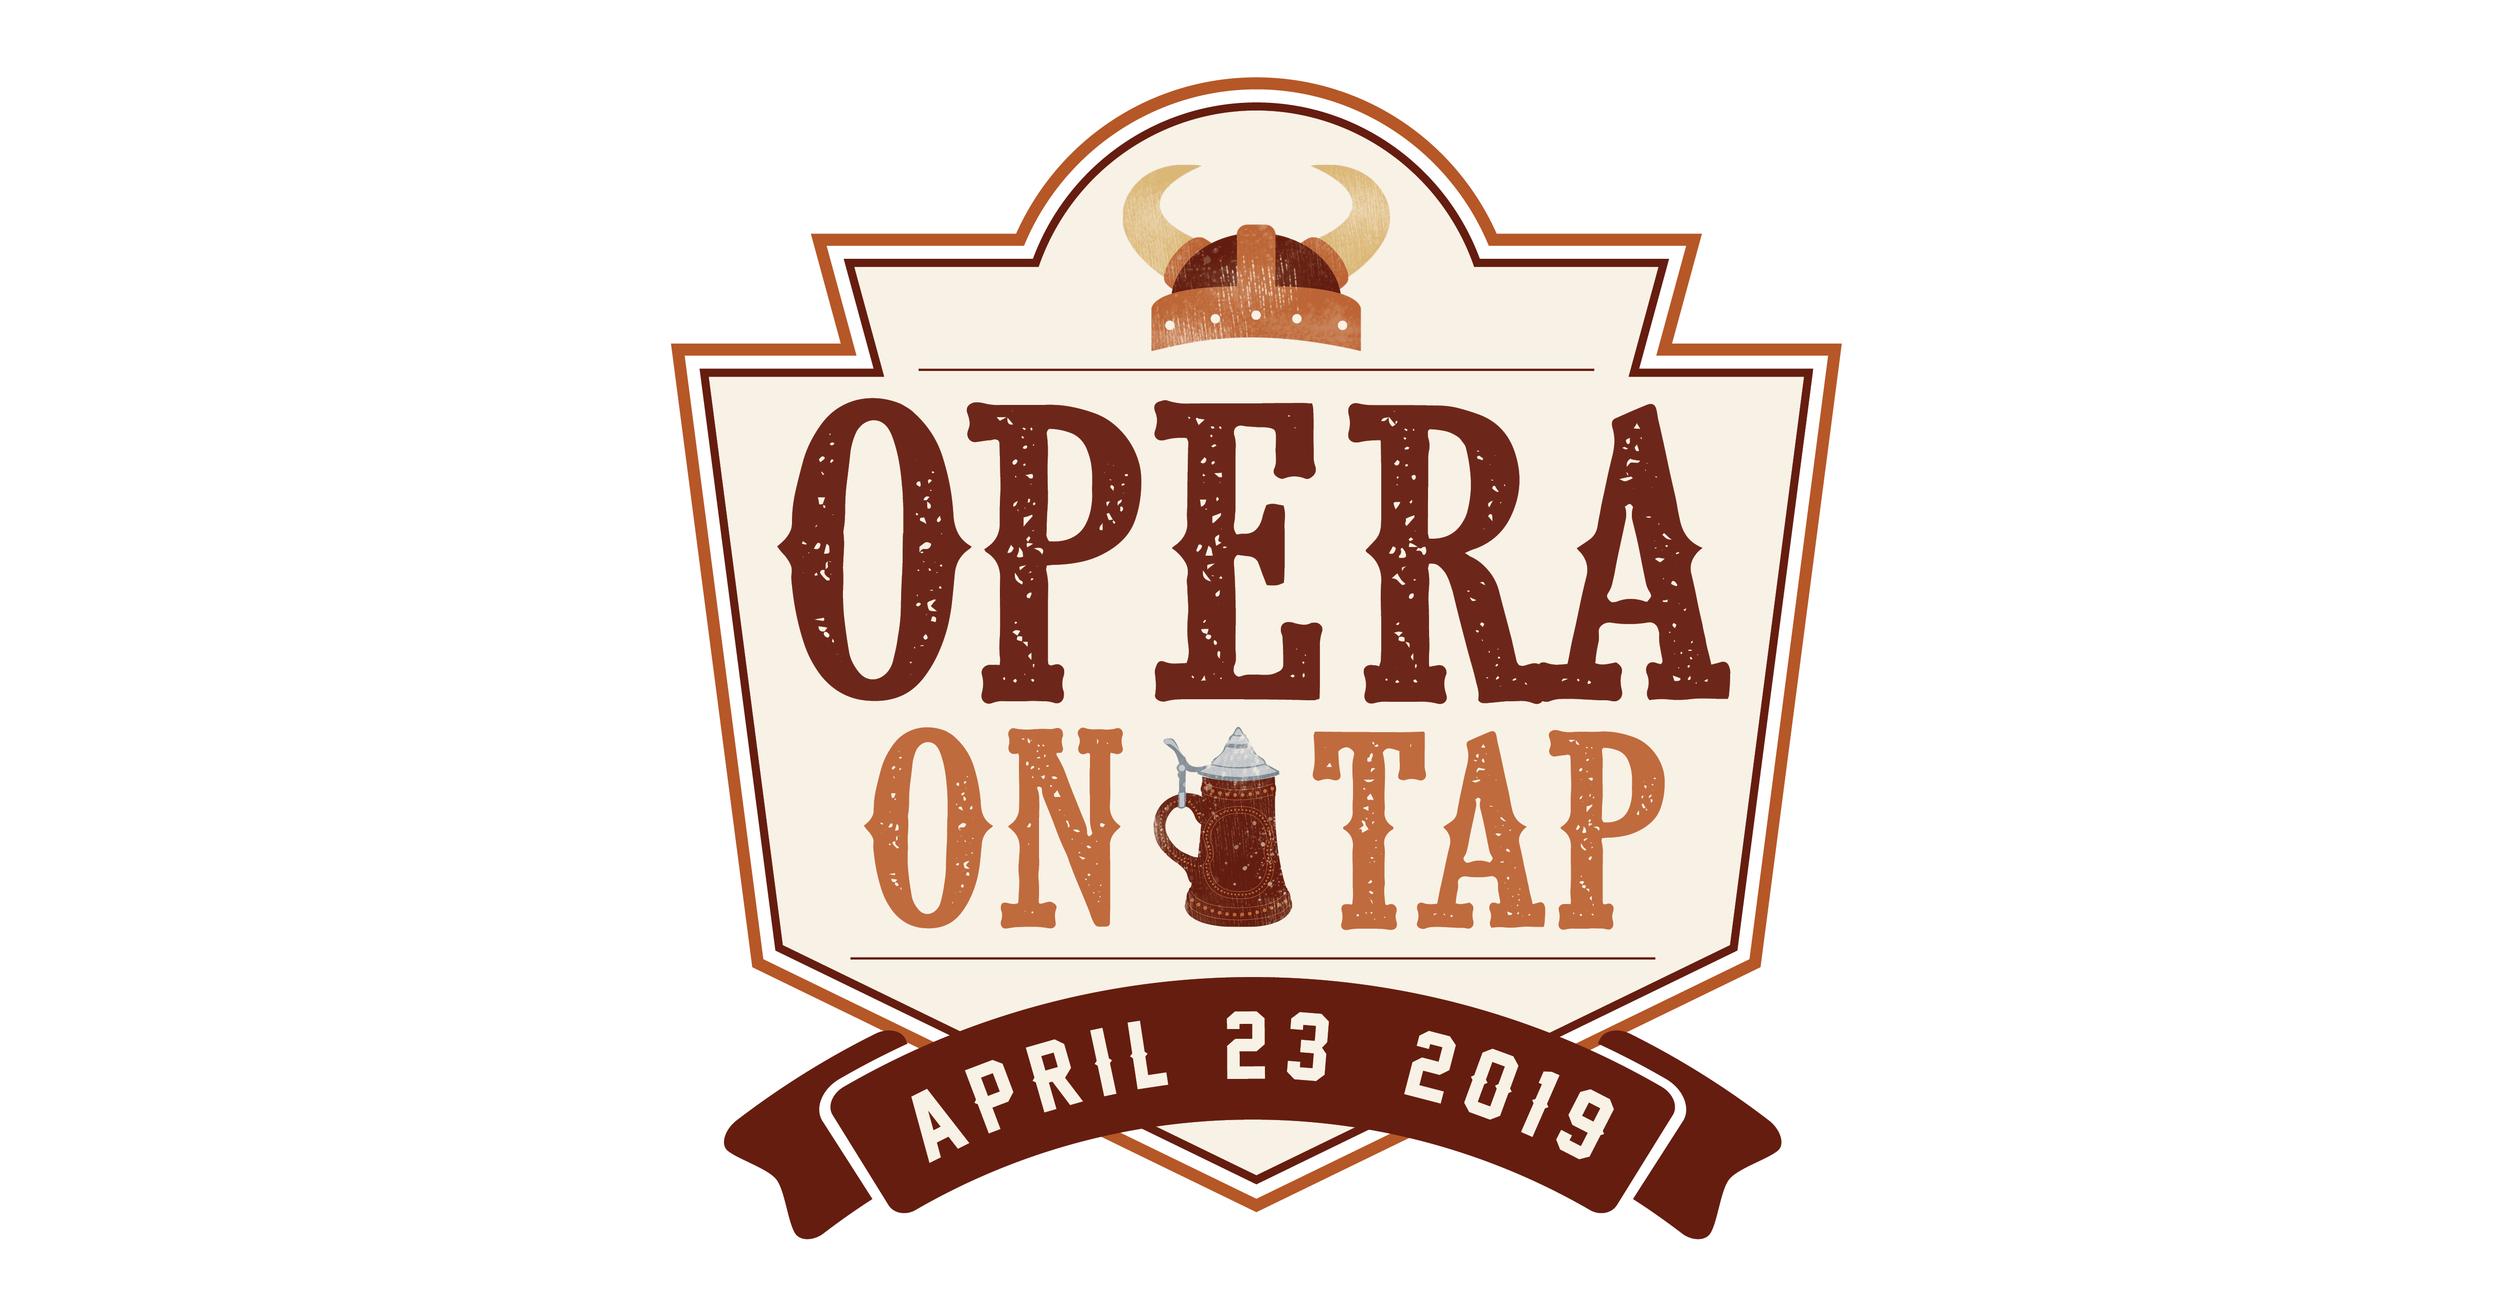 Opera on Tap - April 23, 2019.png